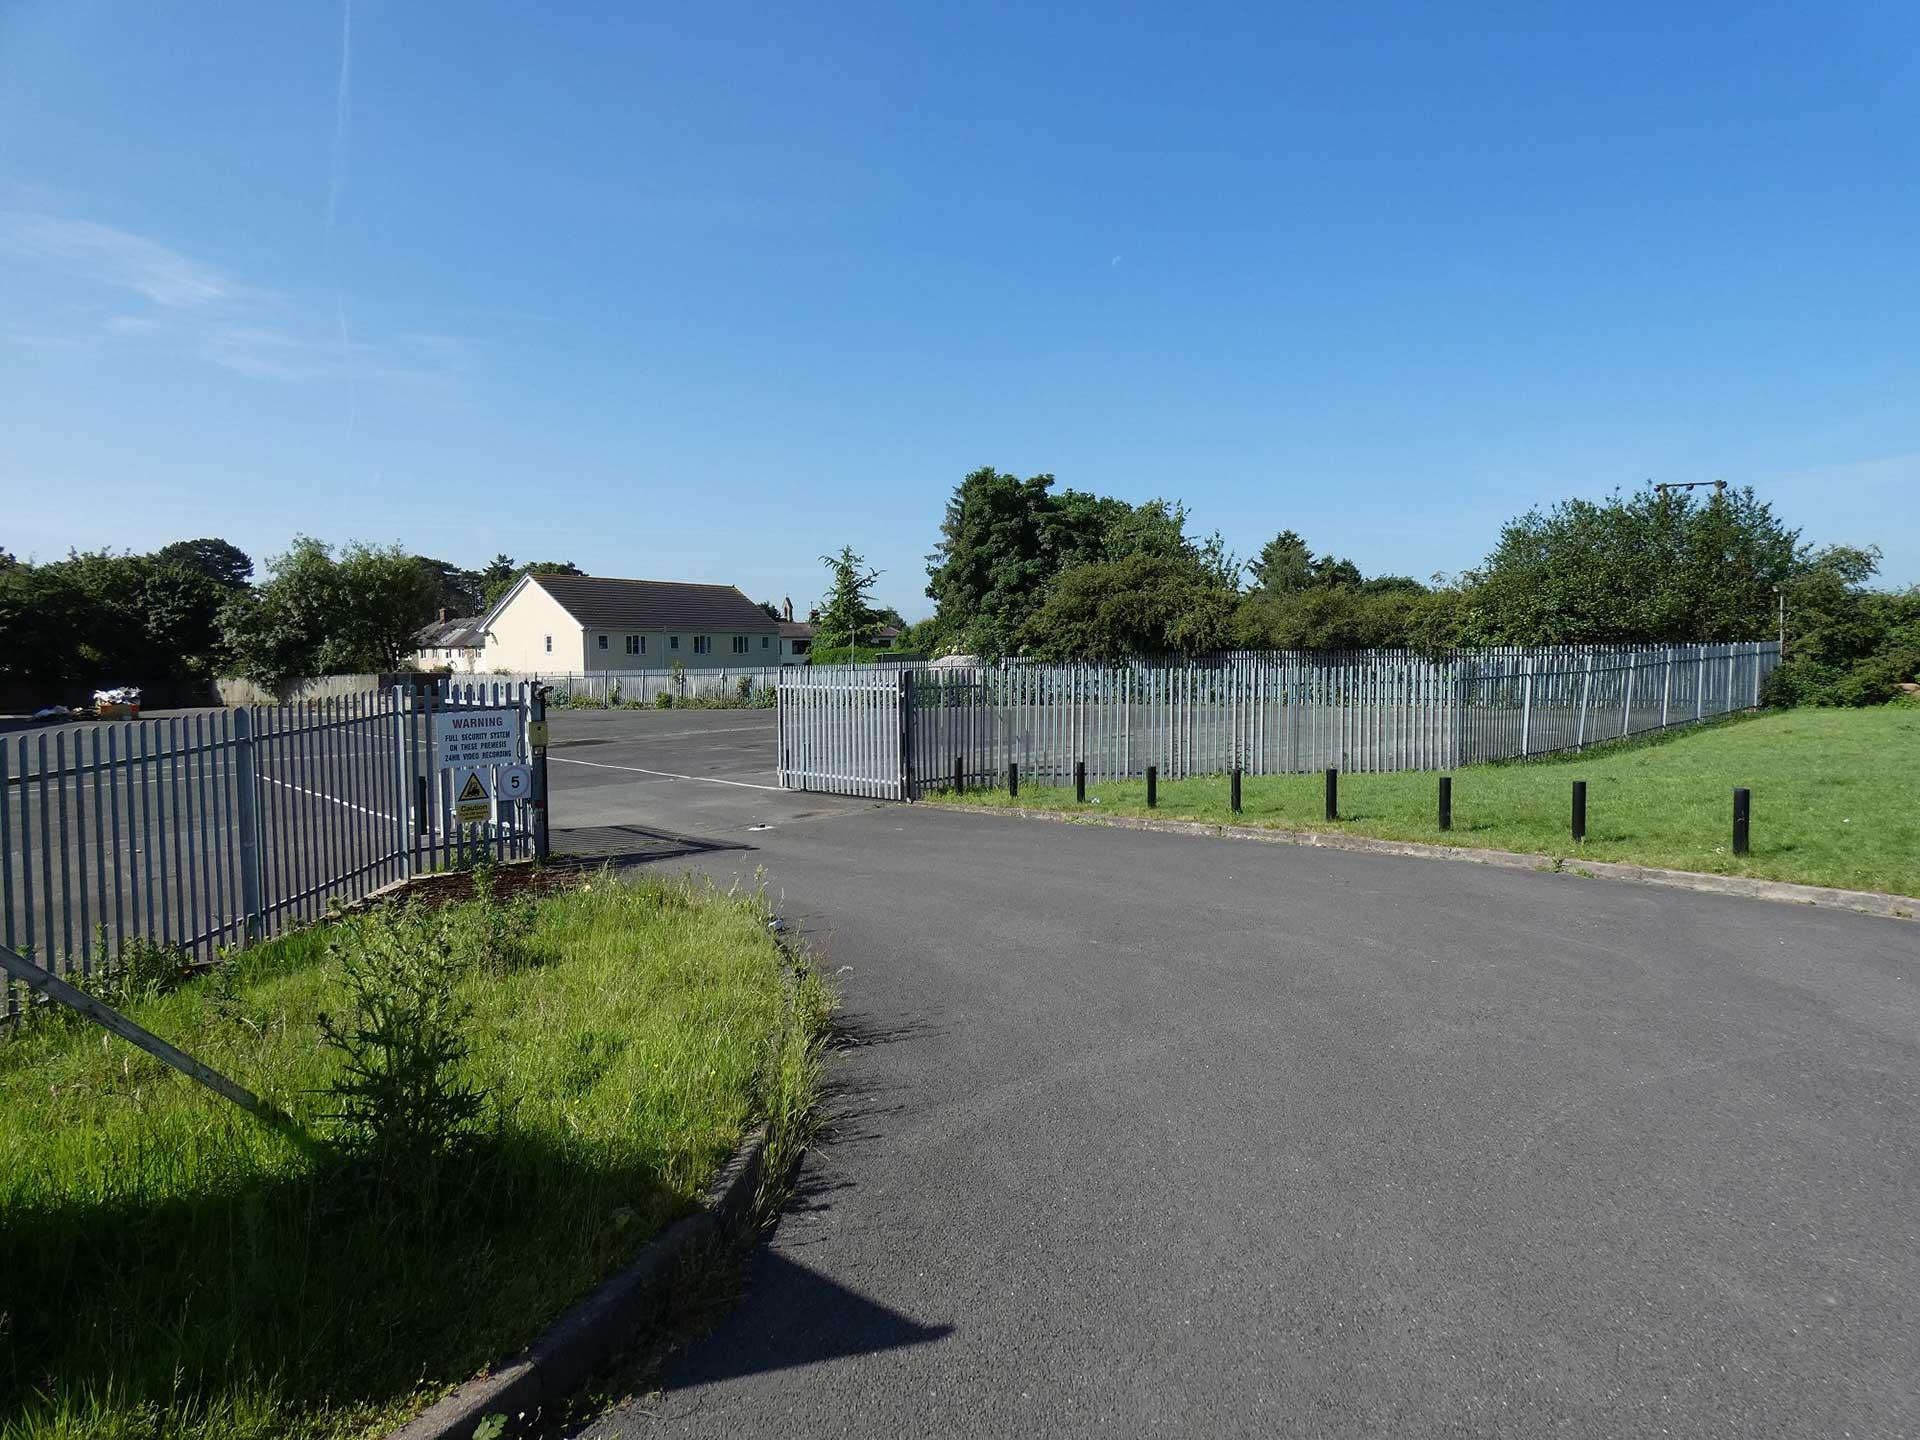 Kalmar House Yard - Express House Yard, Clayton Way, Oxon Business park, Shrewsbury, Shropshire, SY3 5AL